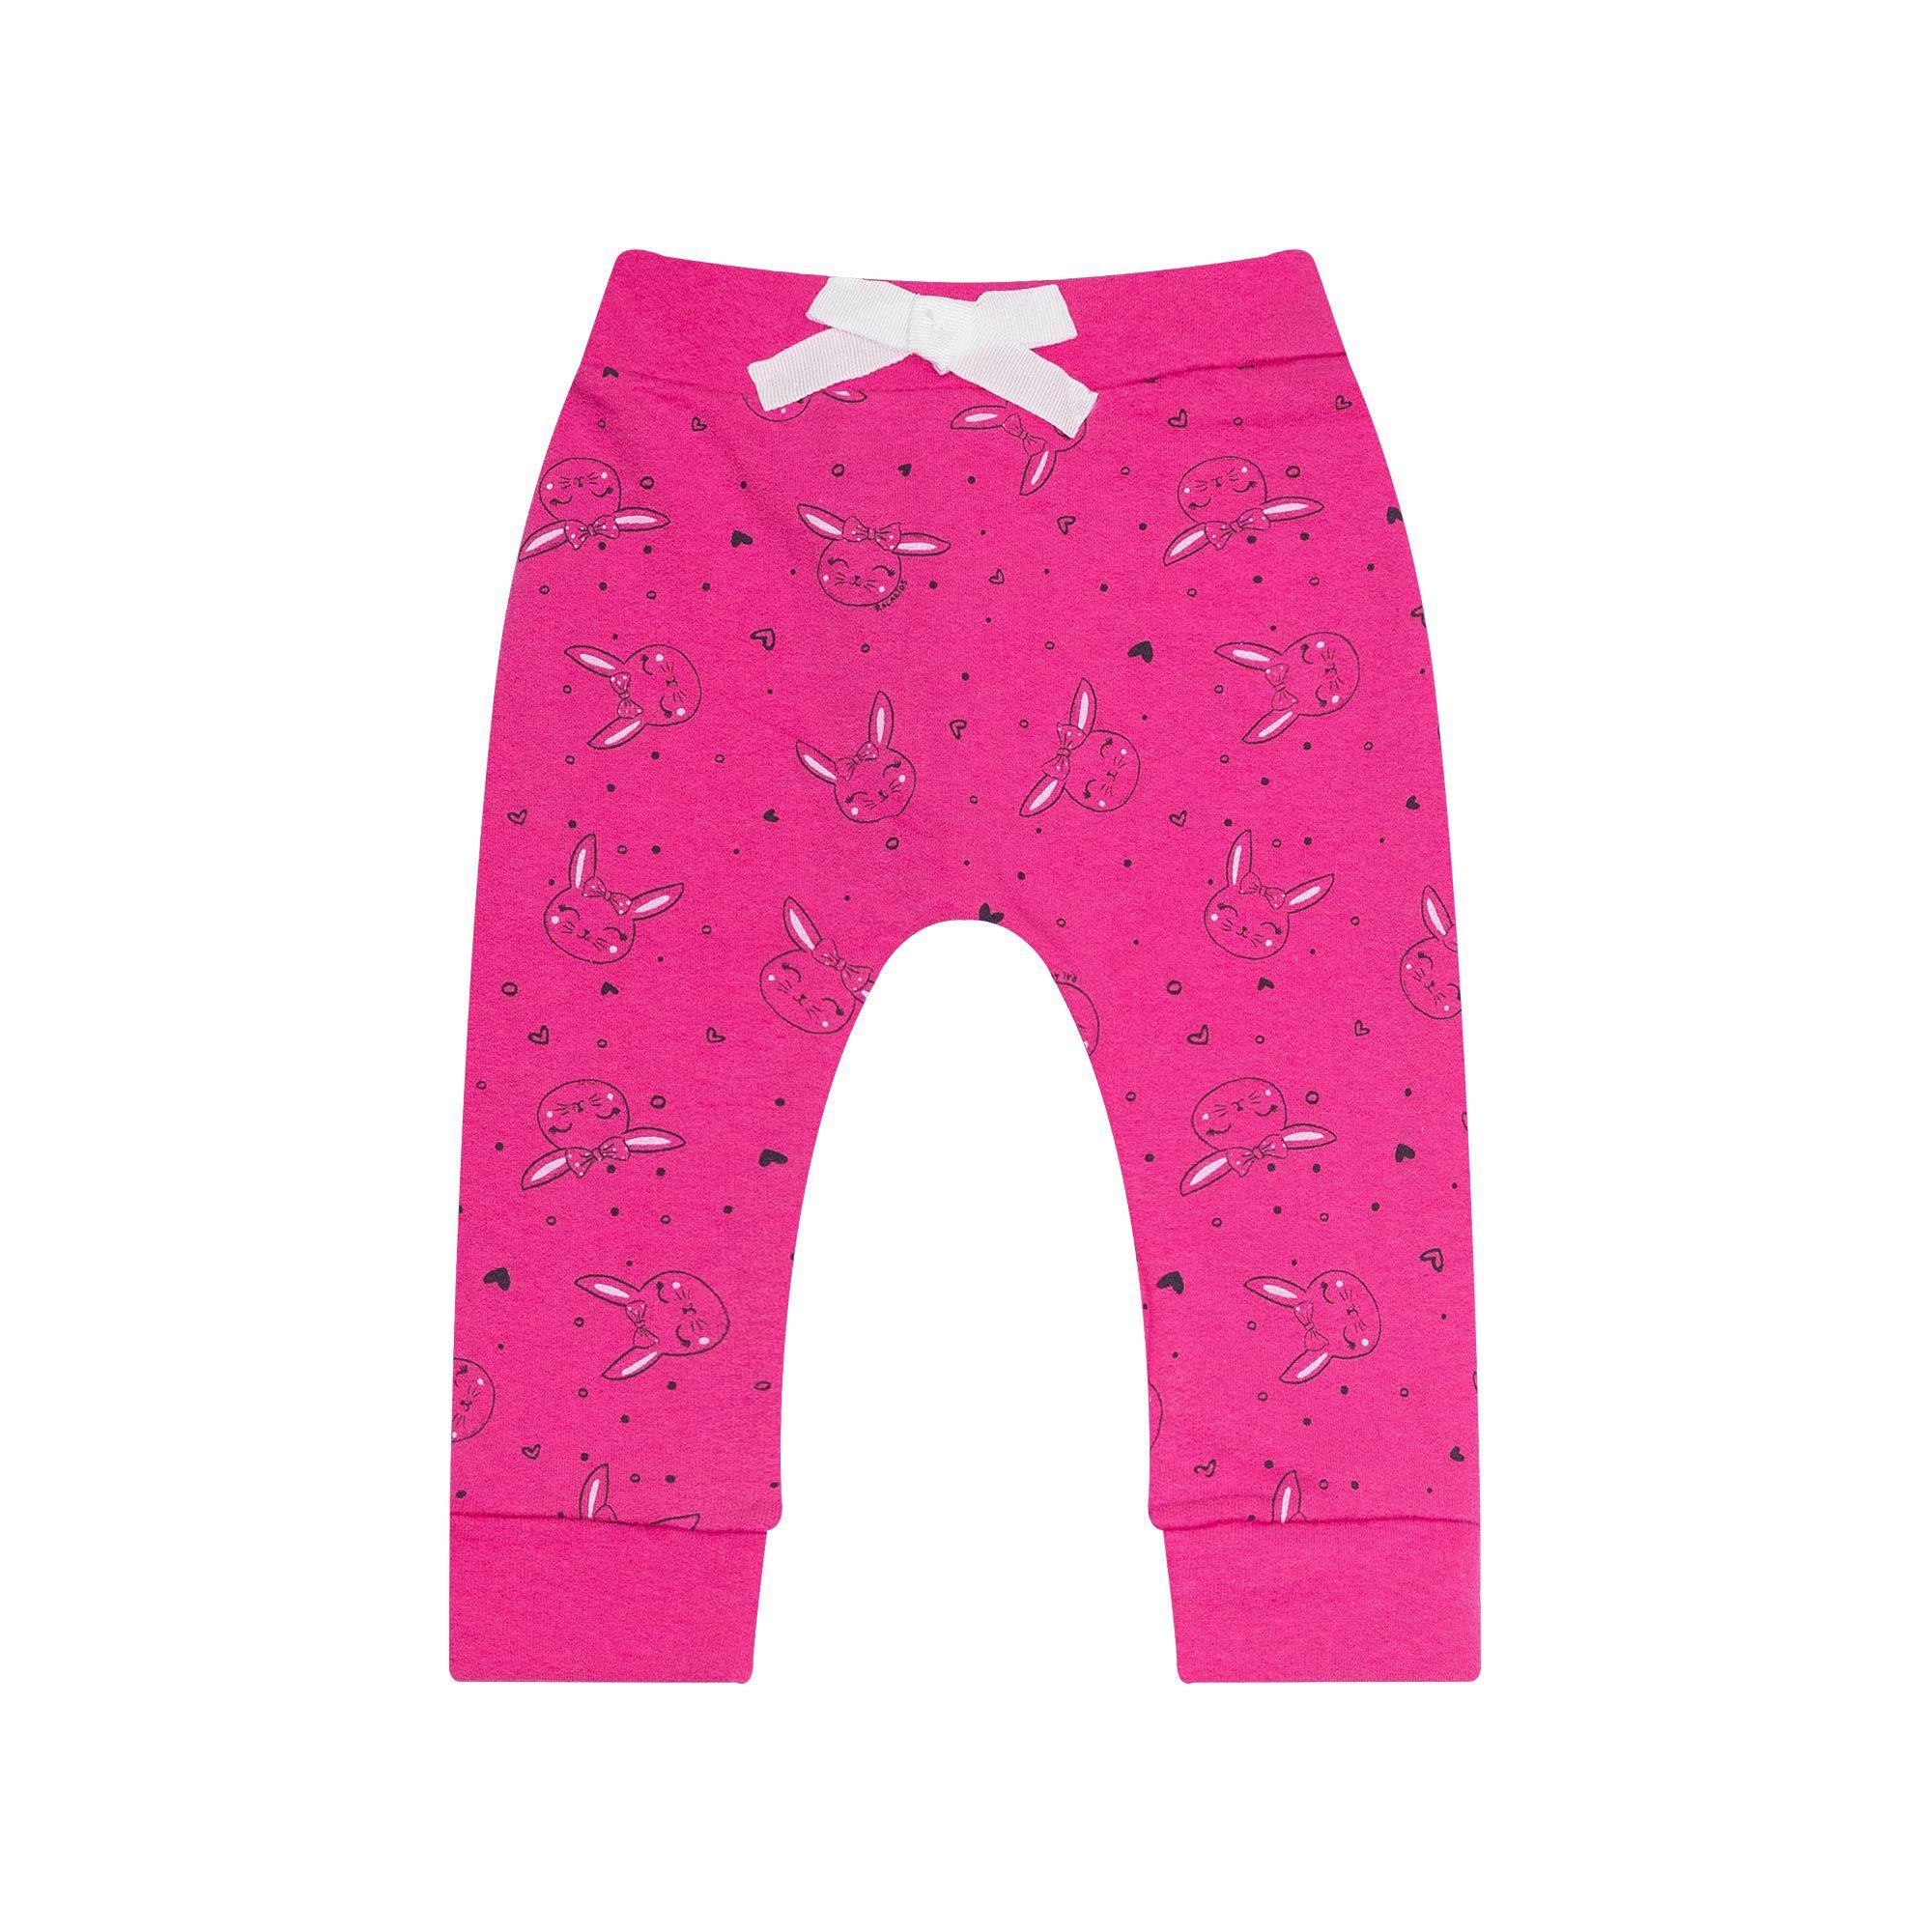 Calça Jogger Infantil Feminino - Ref 7115 - Pink - Ralakids